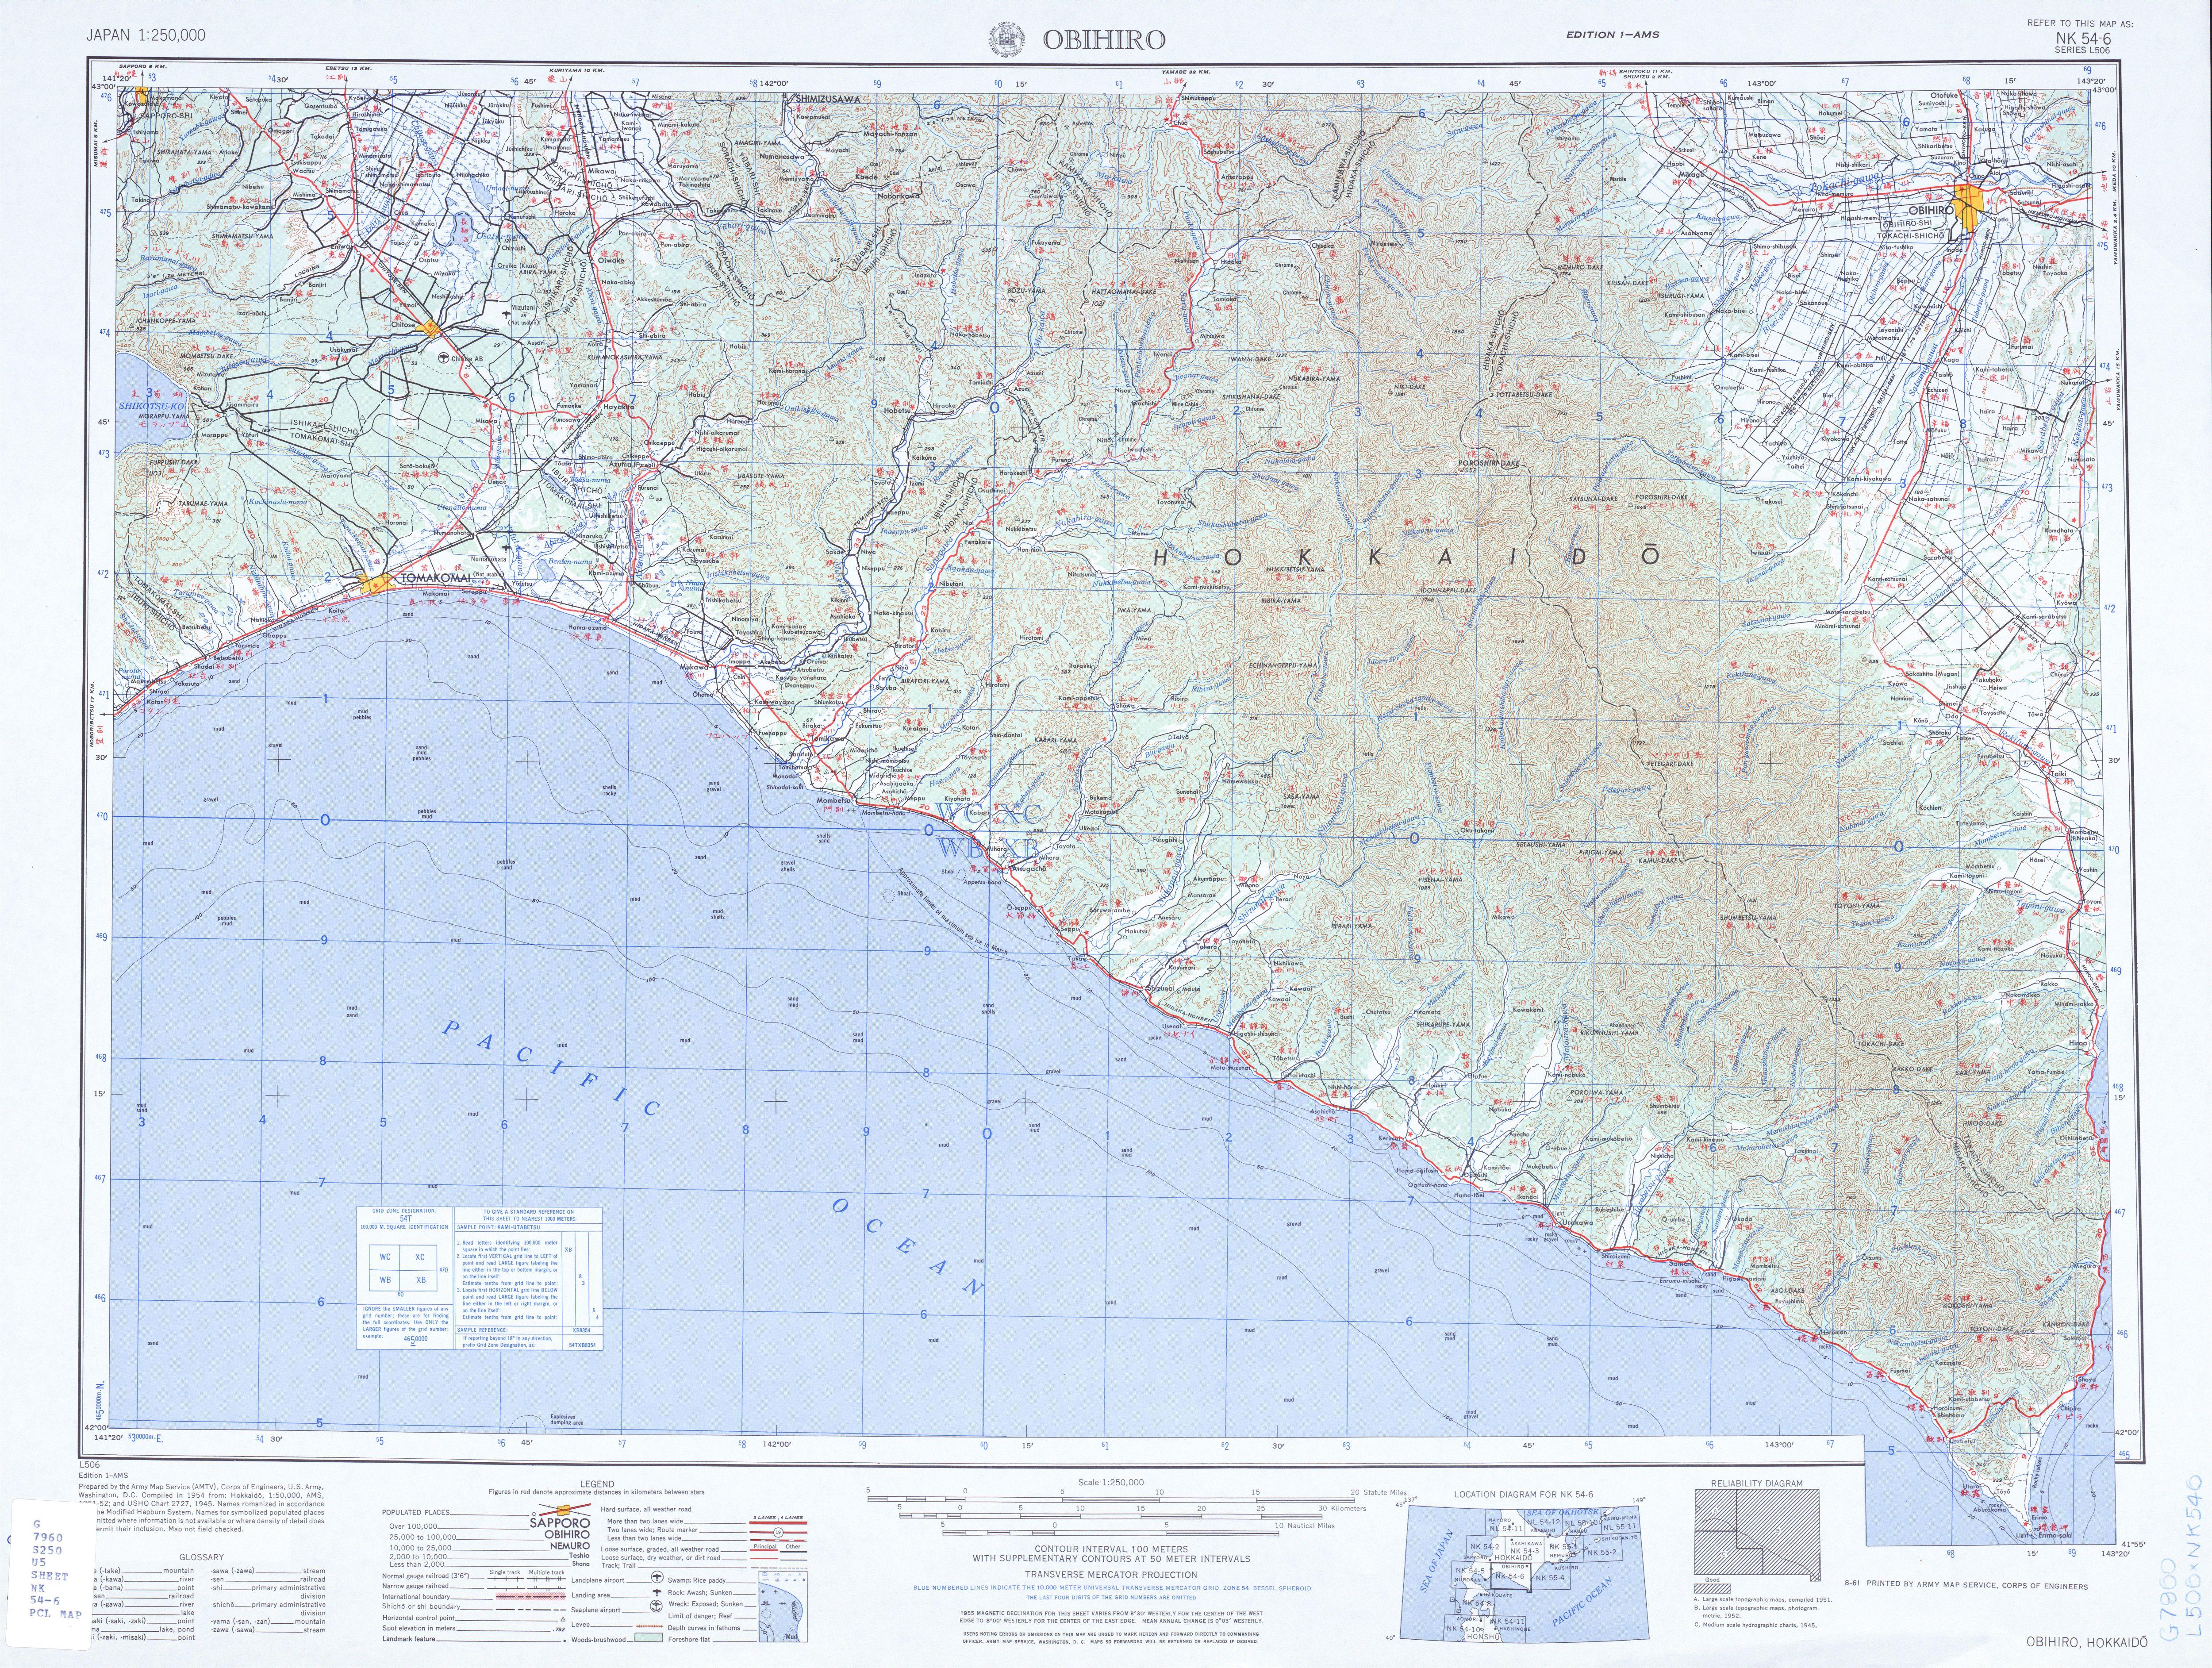 Obihiro Topographic Map Sheet, Japan 1954